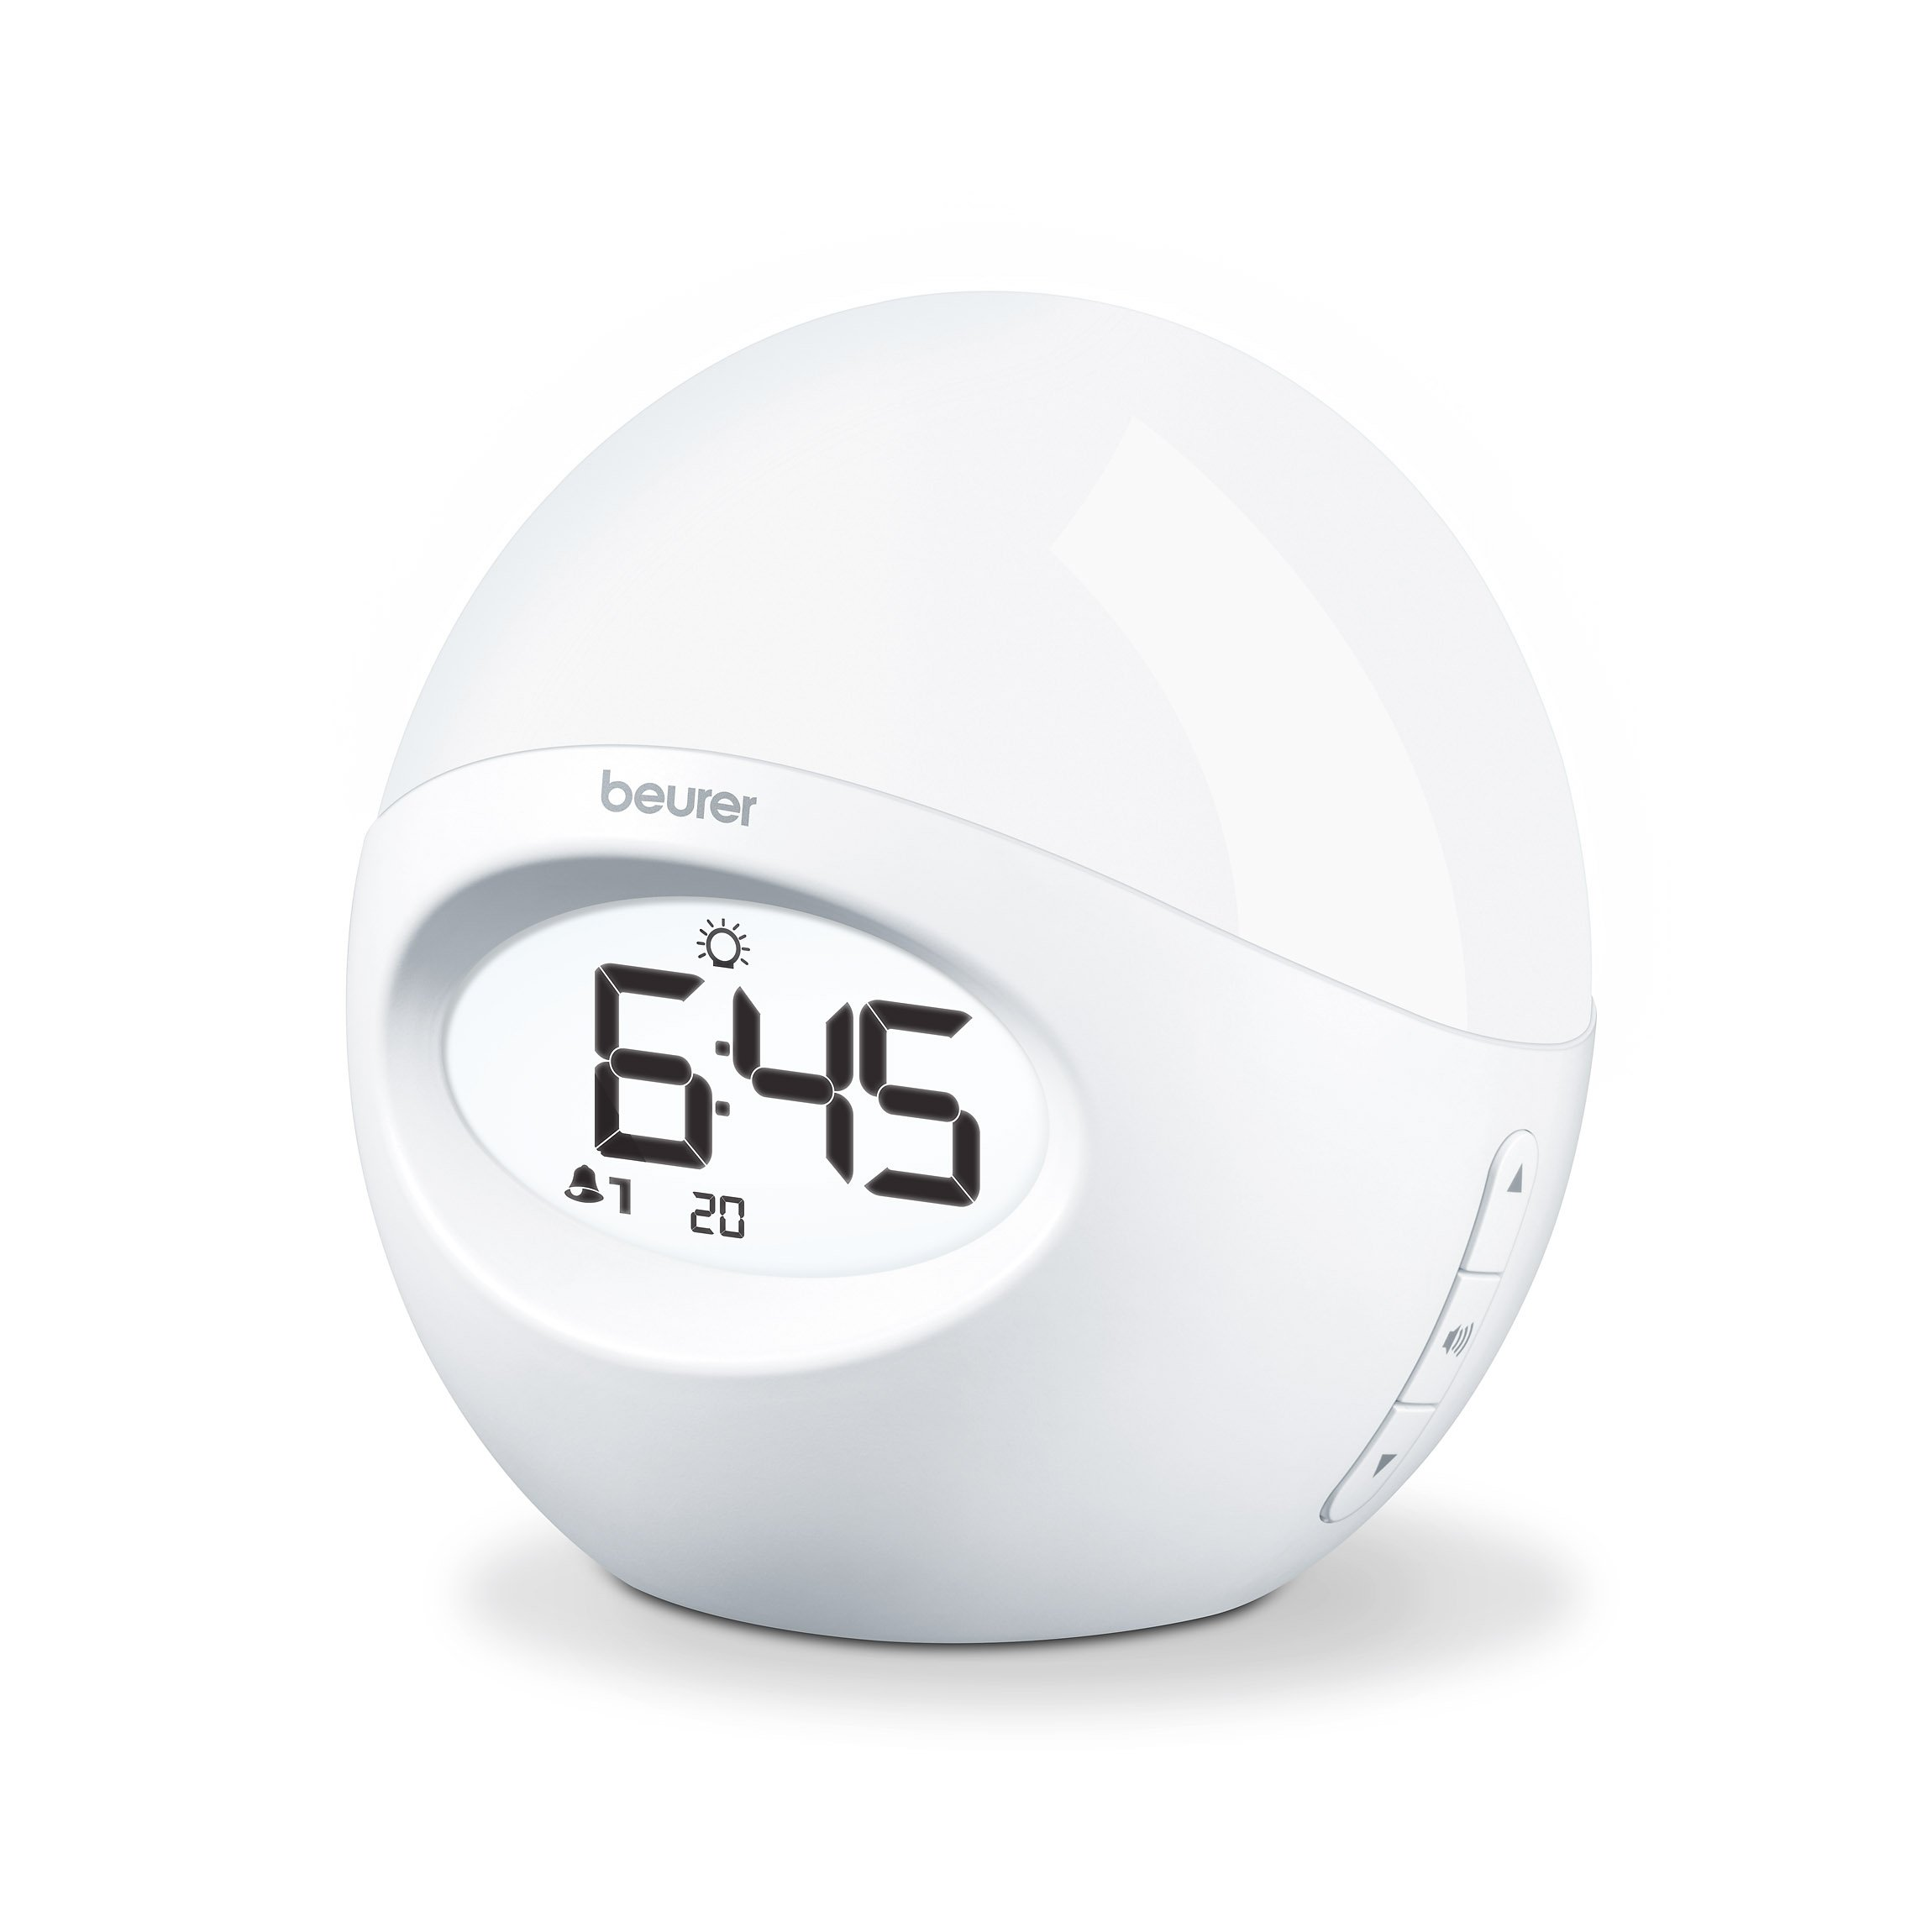 Beurer- WL 32 Wake-Up Light - 3 Years Warranty